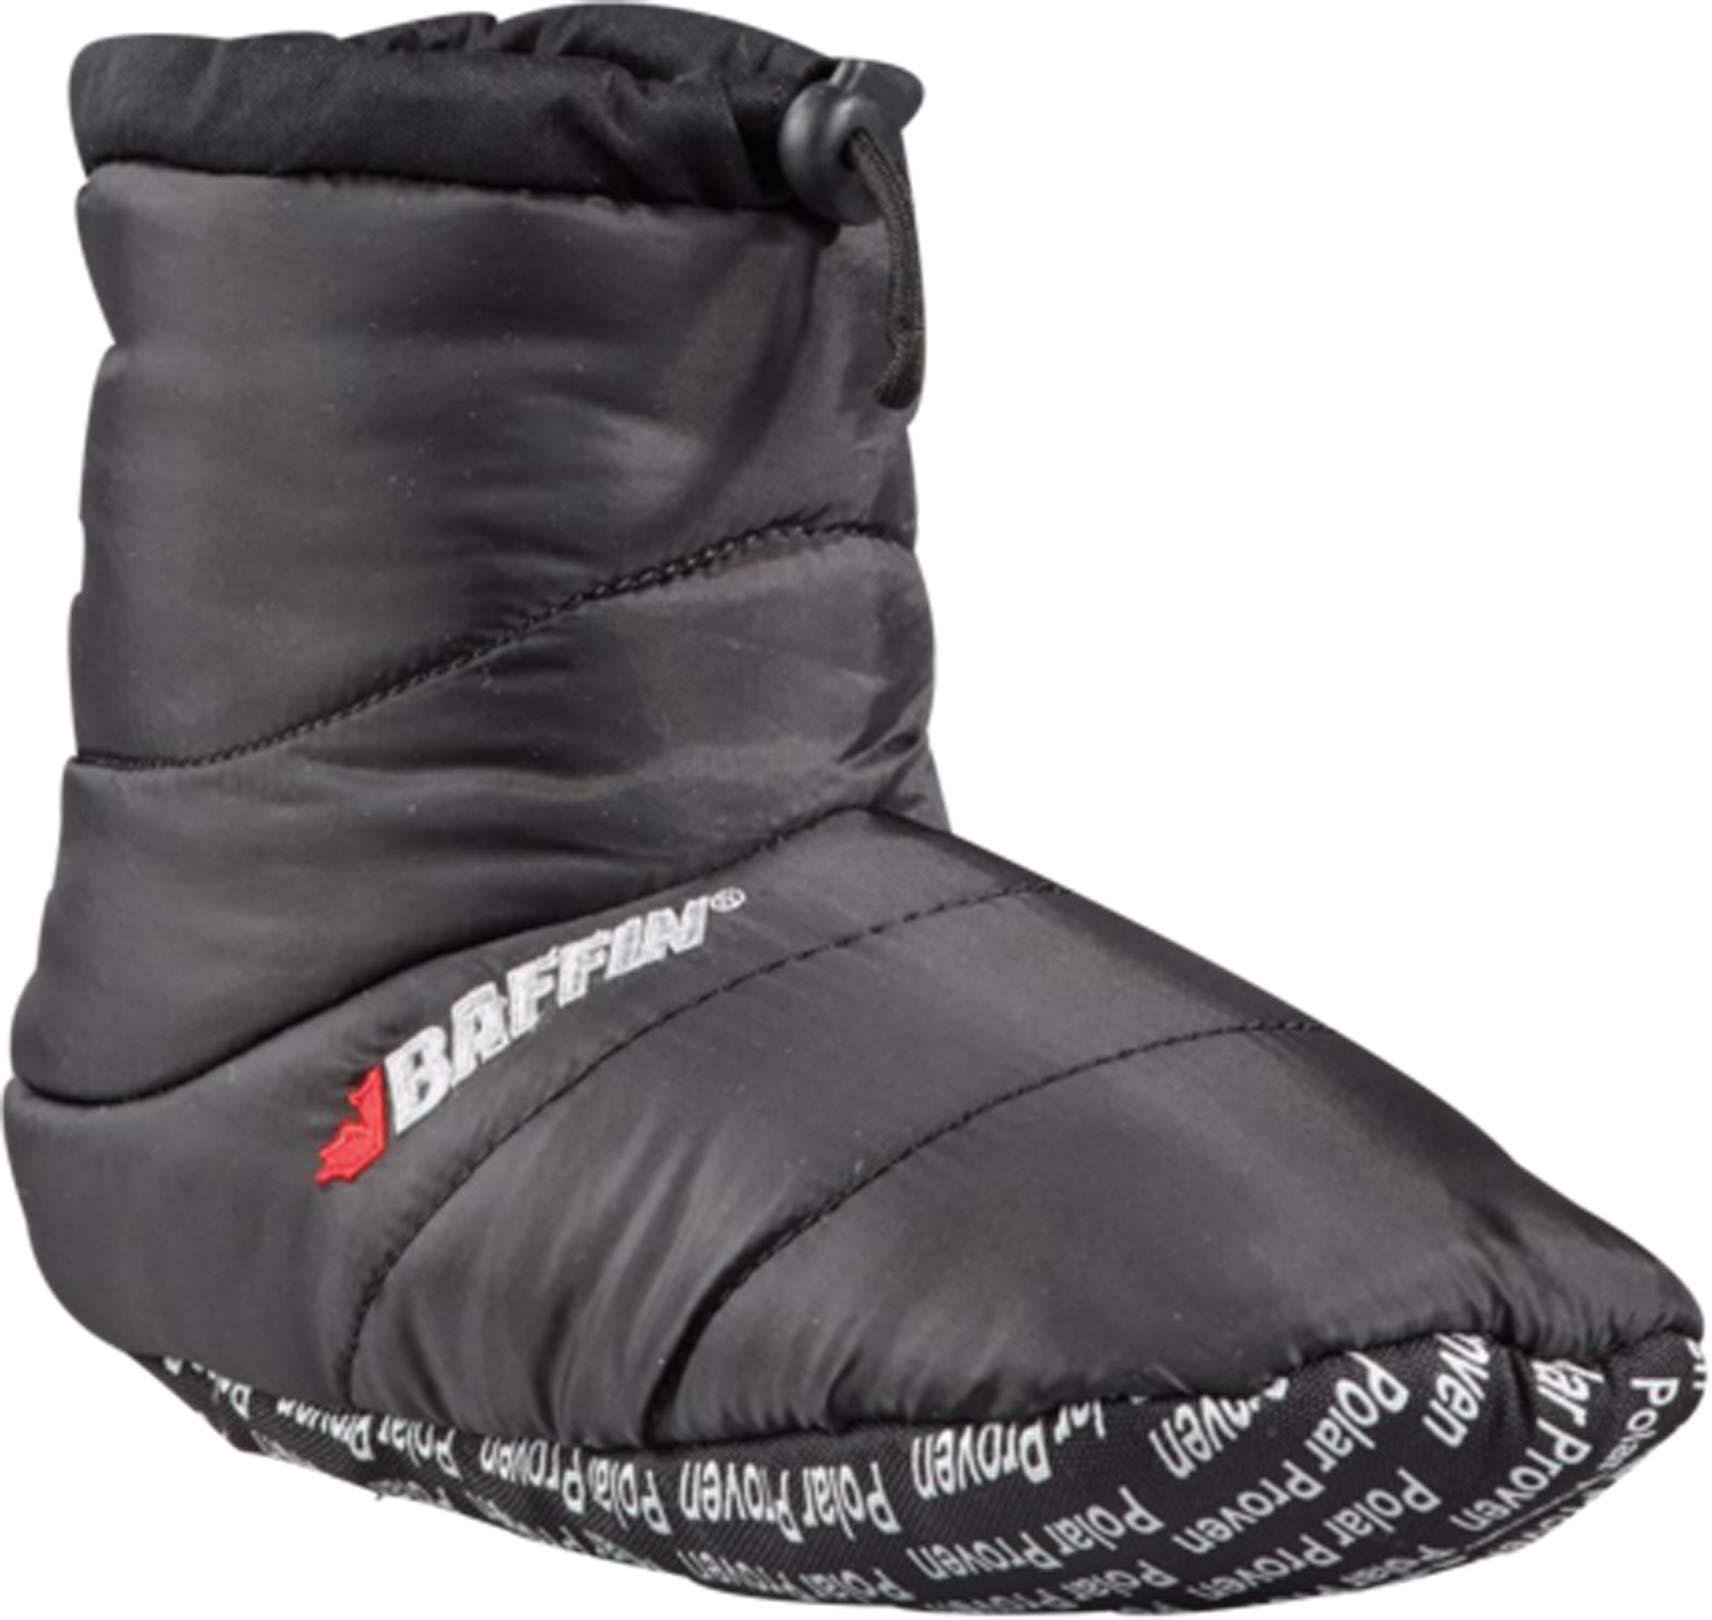 Baffin 61300000 Kid's Cush Booty Boot, Charcoal - YL